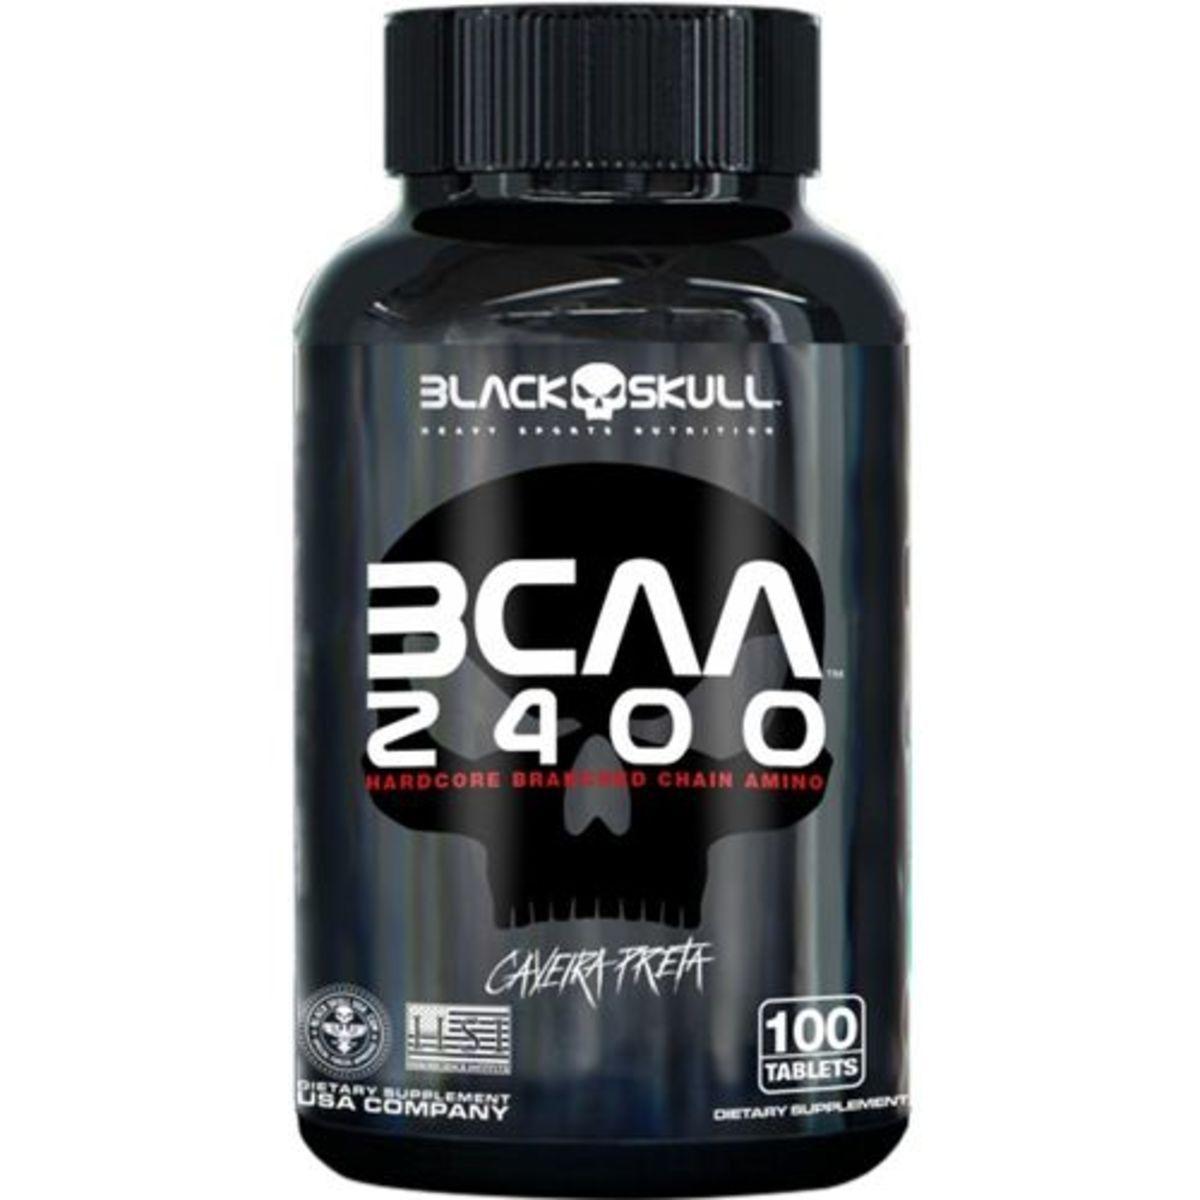 Bcaa 2400 100 Tabletes - Black Skull - Caveira Preta